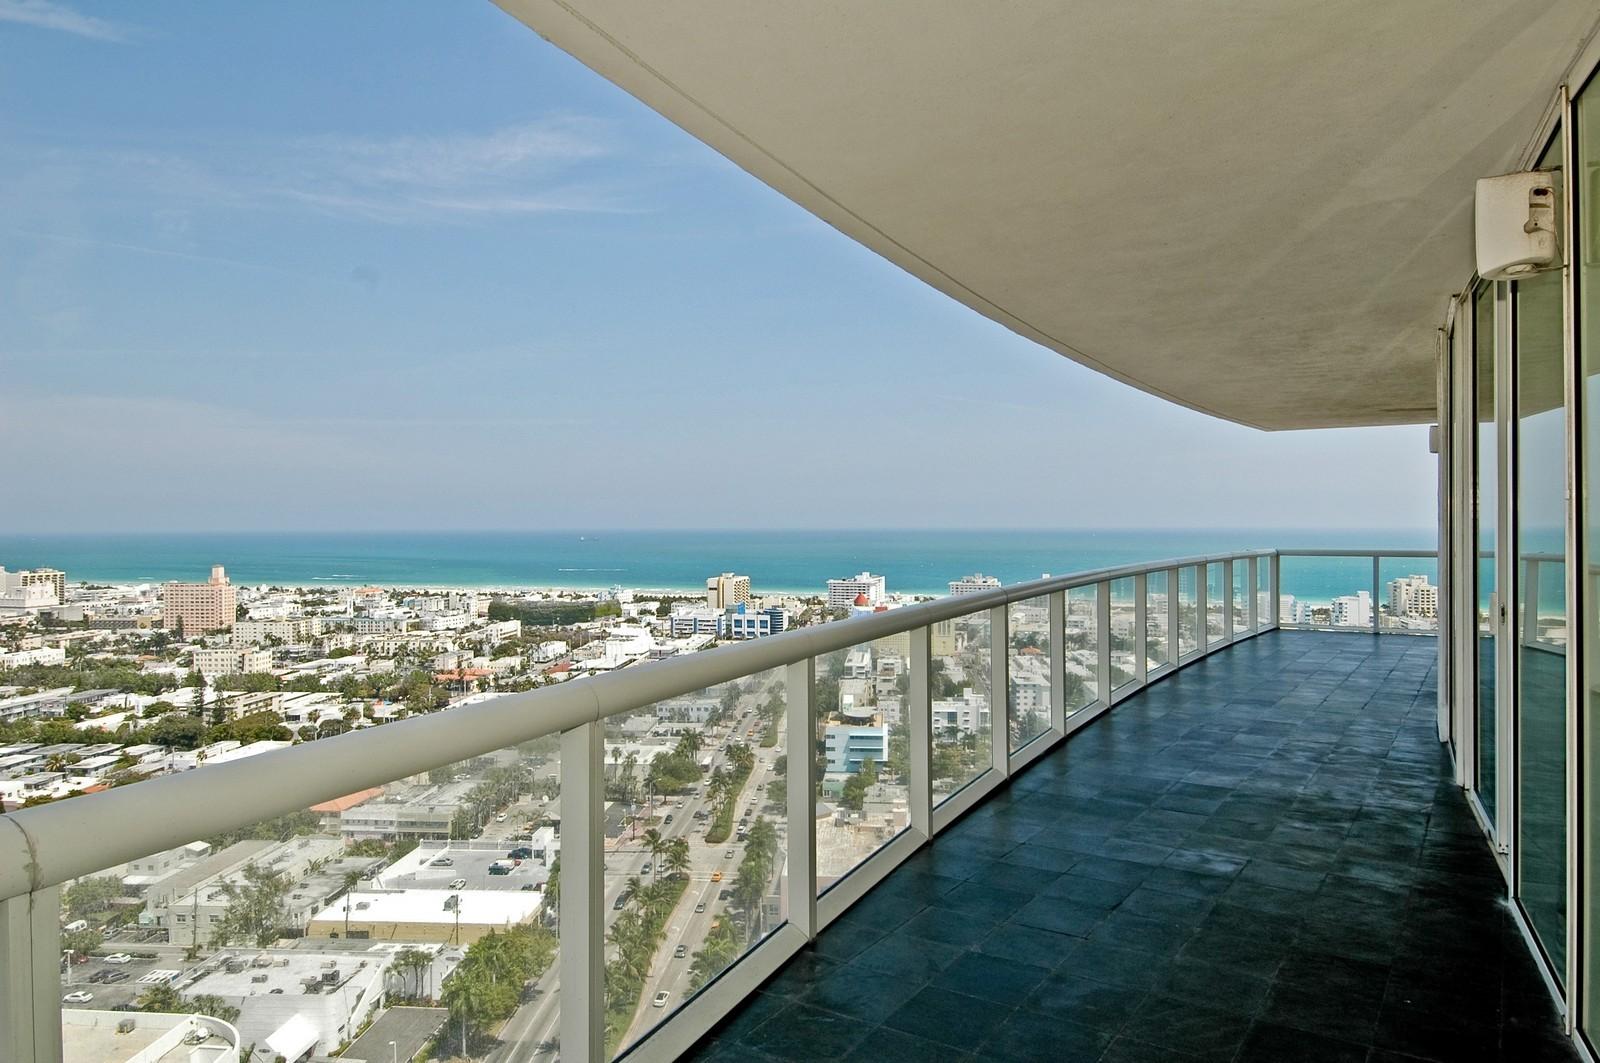 Real Estate Photography - 450 Alton Rd, Unit 2910, Miami Beach, FL, 33139 - Balcony